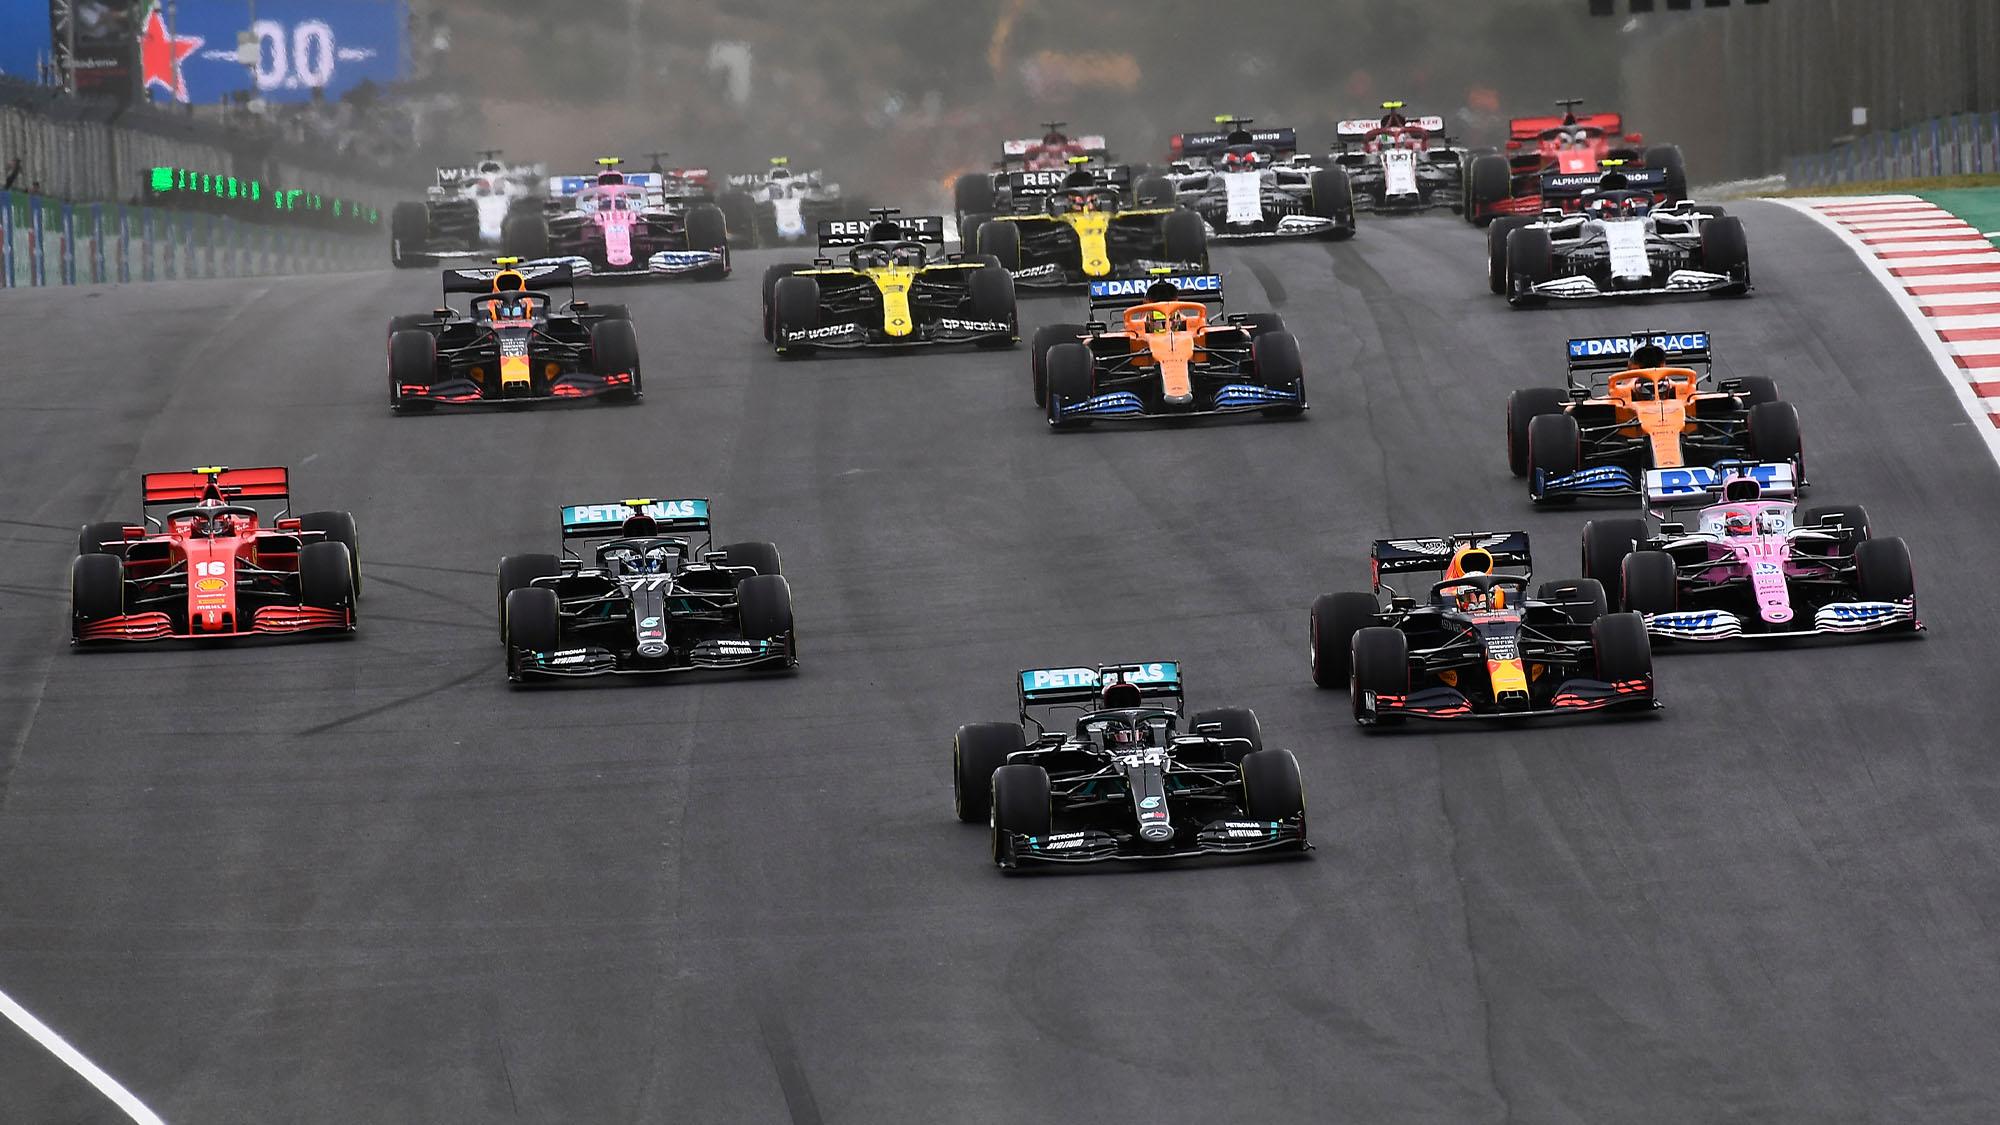 Lewis Hamilton (Mercedes) takes the lead at the start of the 2020 Portuguese Grand Prix in Portimao. Photo: Grand Prix Photo